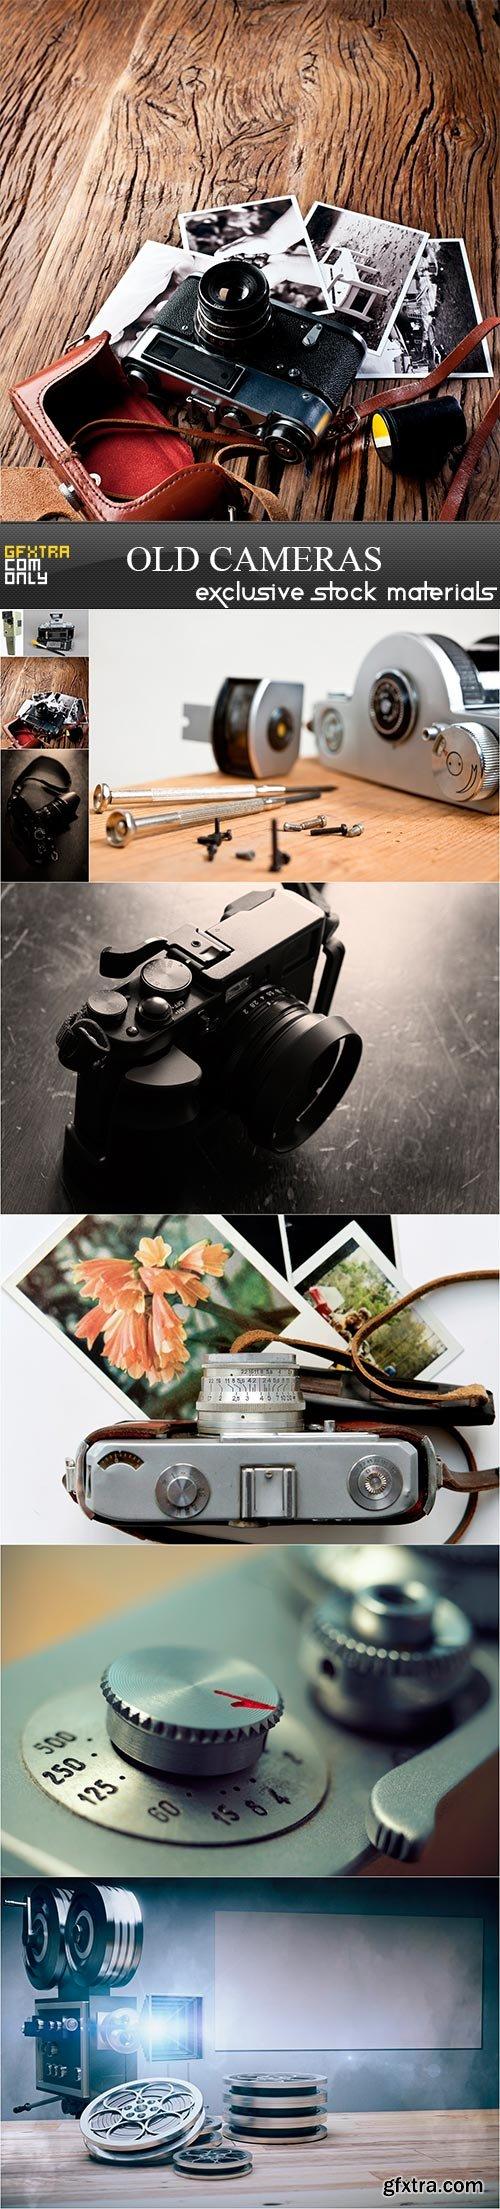 Old cameras, 9 x UHQ JPEG